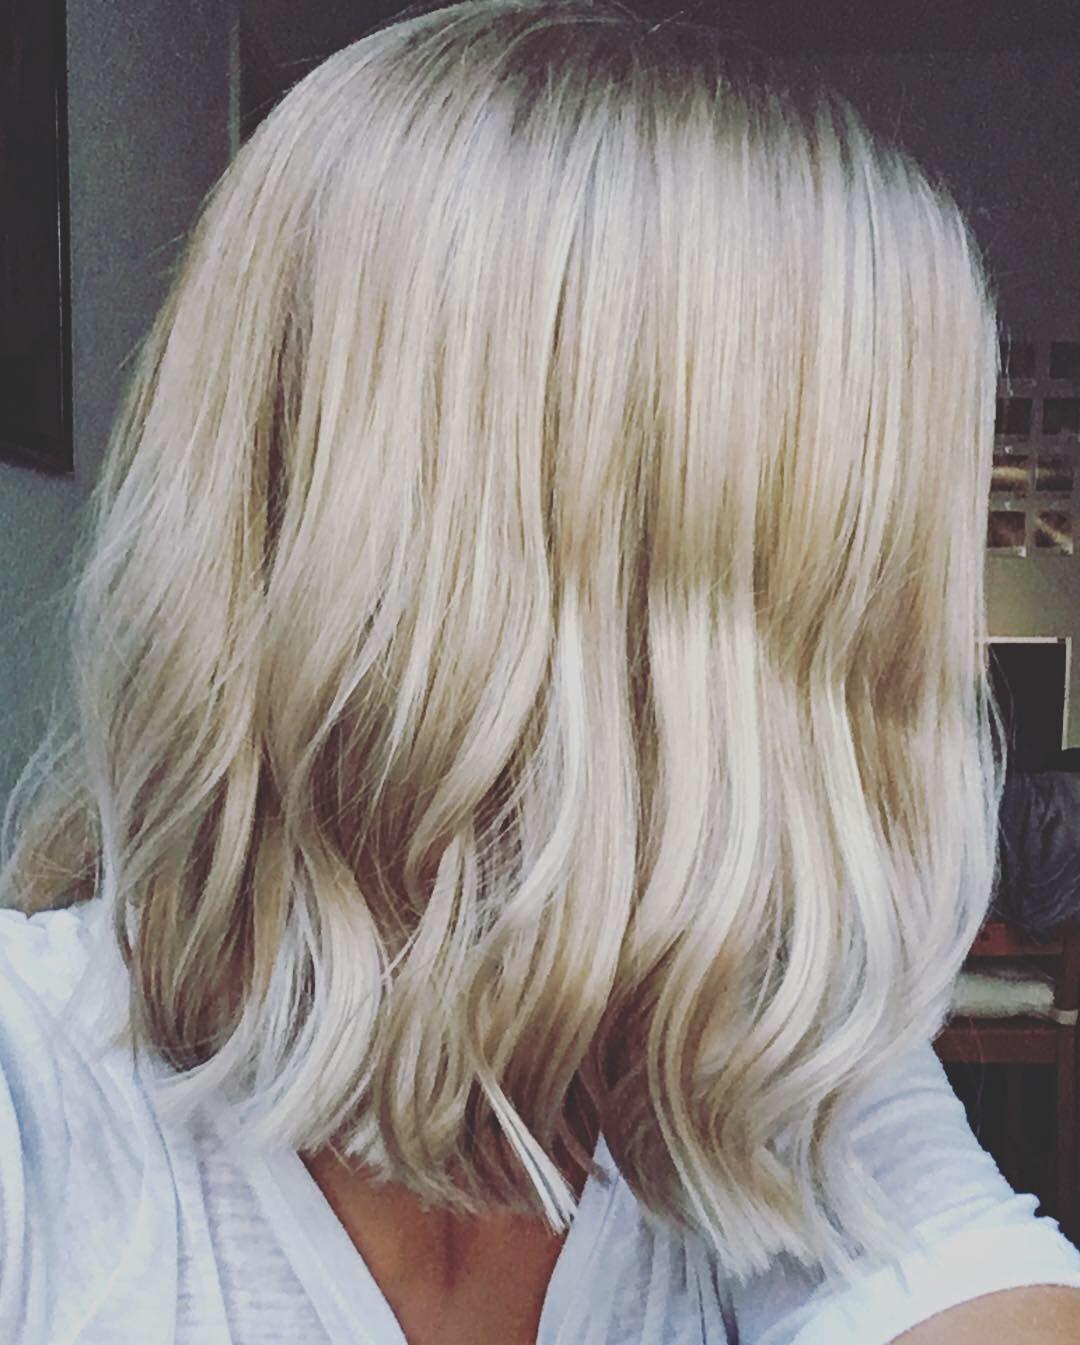 Longbob Mittellanges Haar Blond Girl Frisur Frisurideen